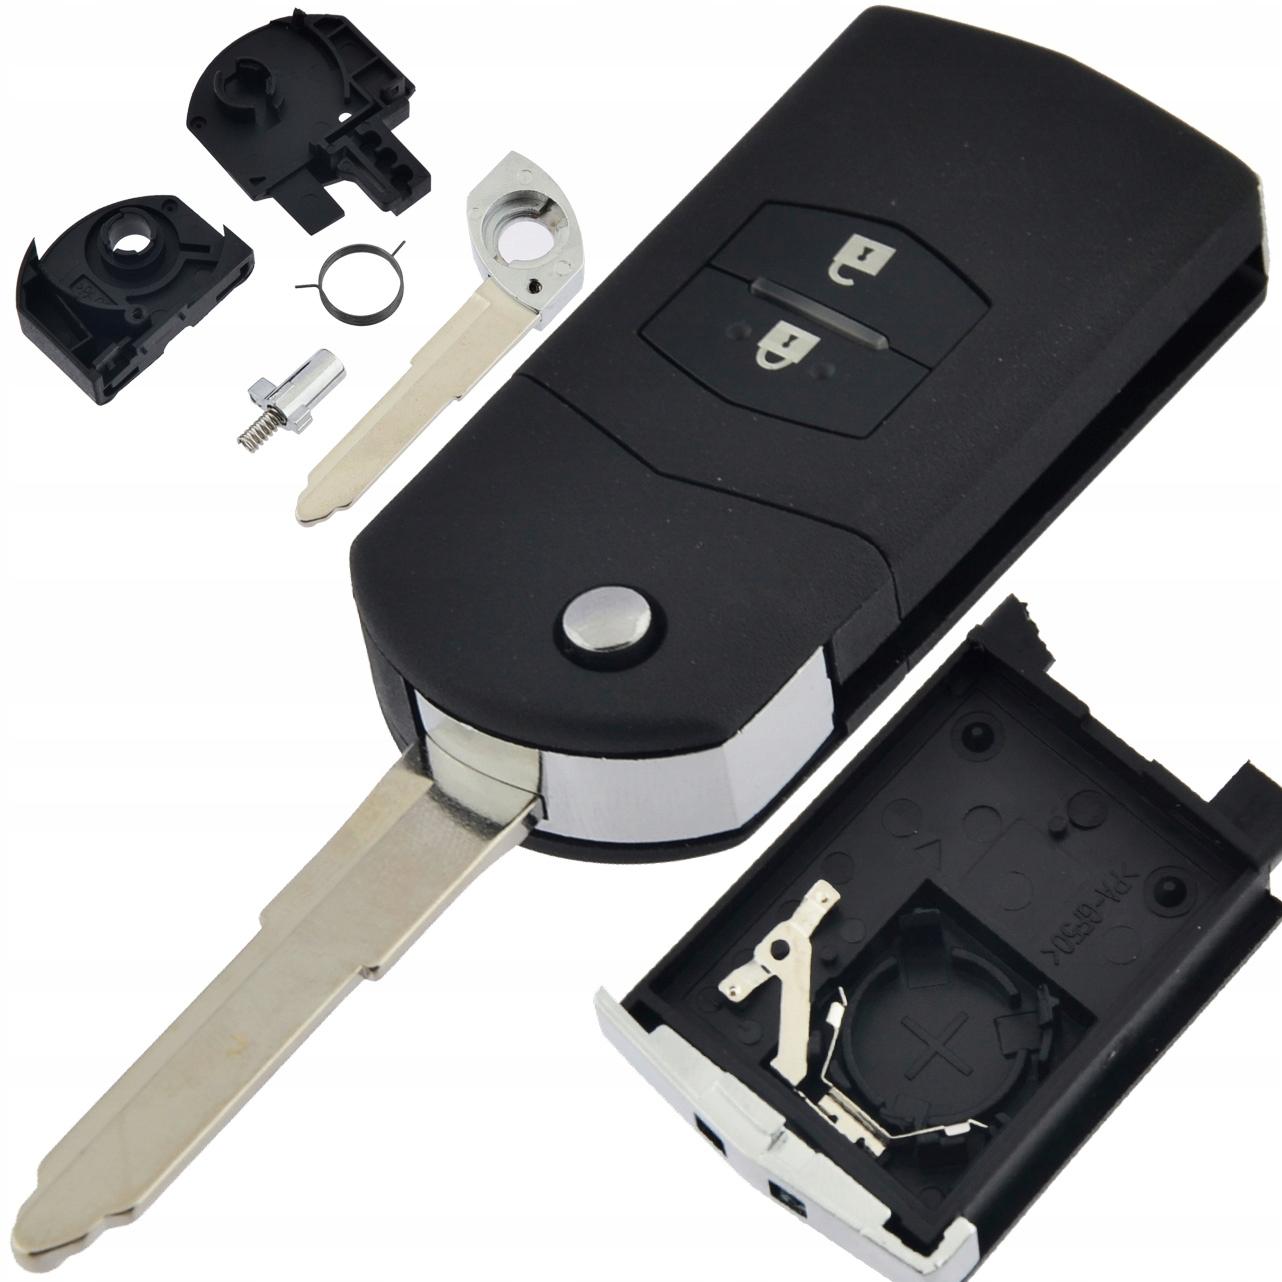 корпус пульт ключ к mazda 2 3 5 6 cx-7 rx-8